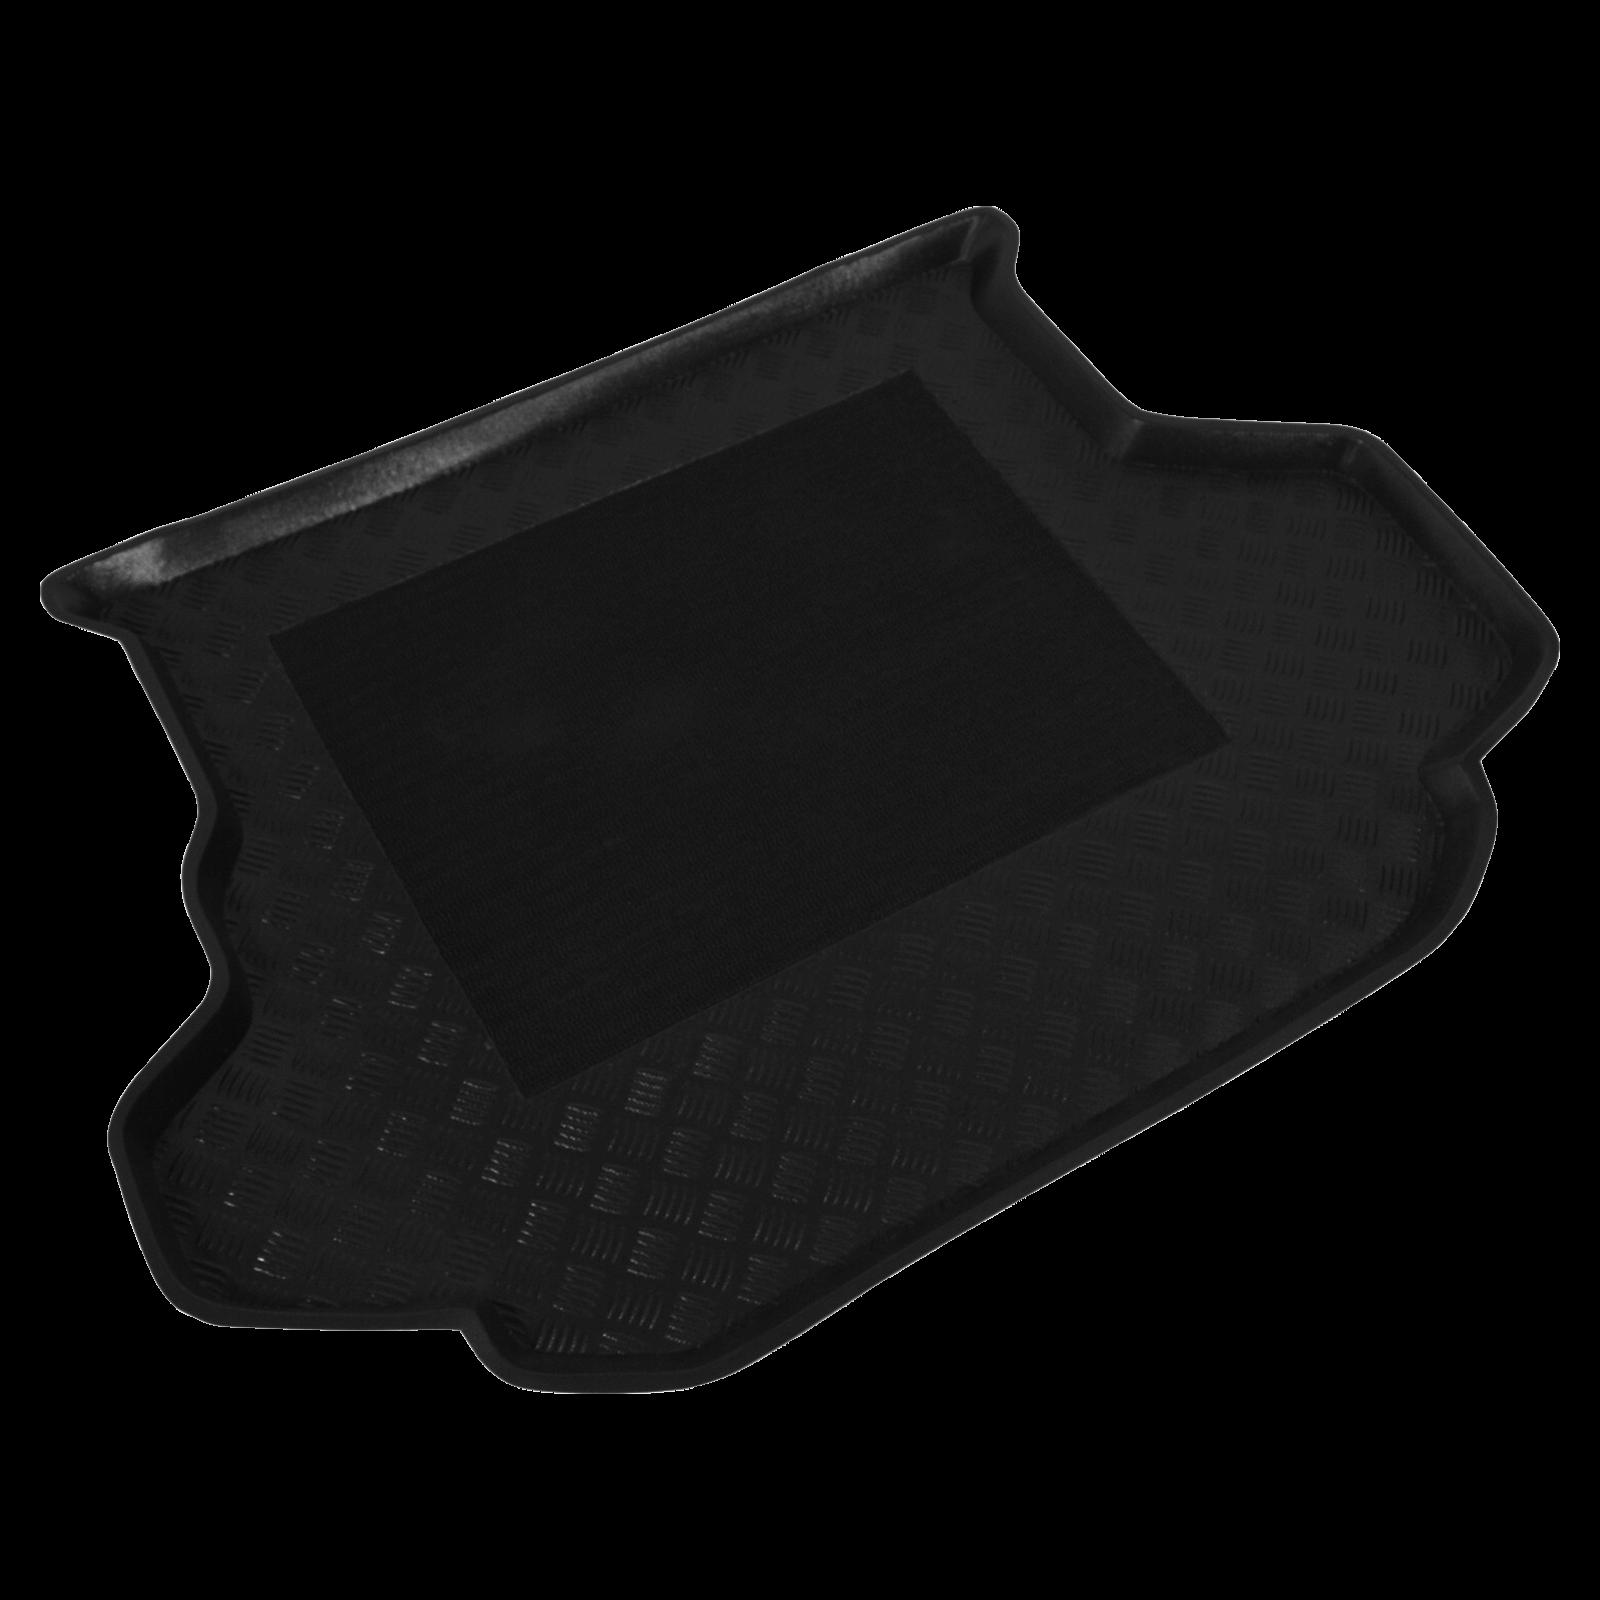 kofferraumwanne schwarz f r kia carens ii gro raumlimousine bj. Black Bedroom Furniture Sets. Home Design Ideas